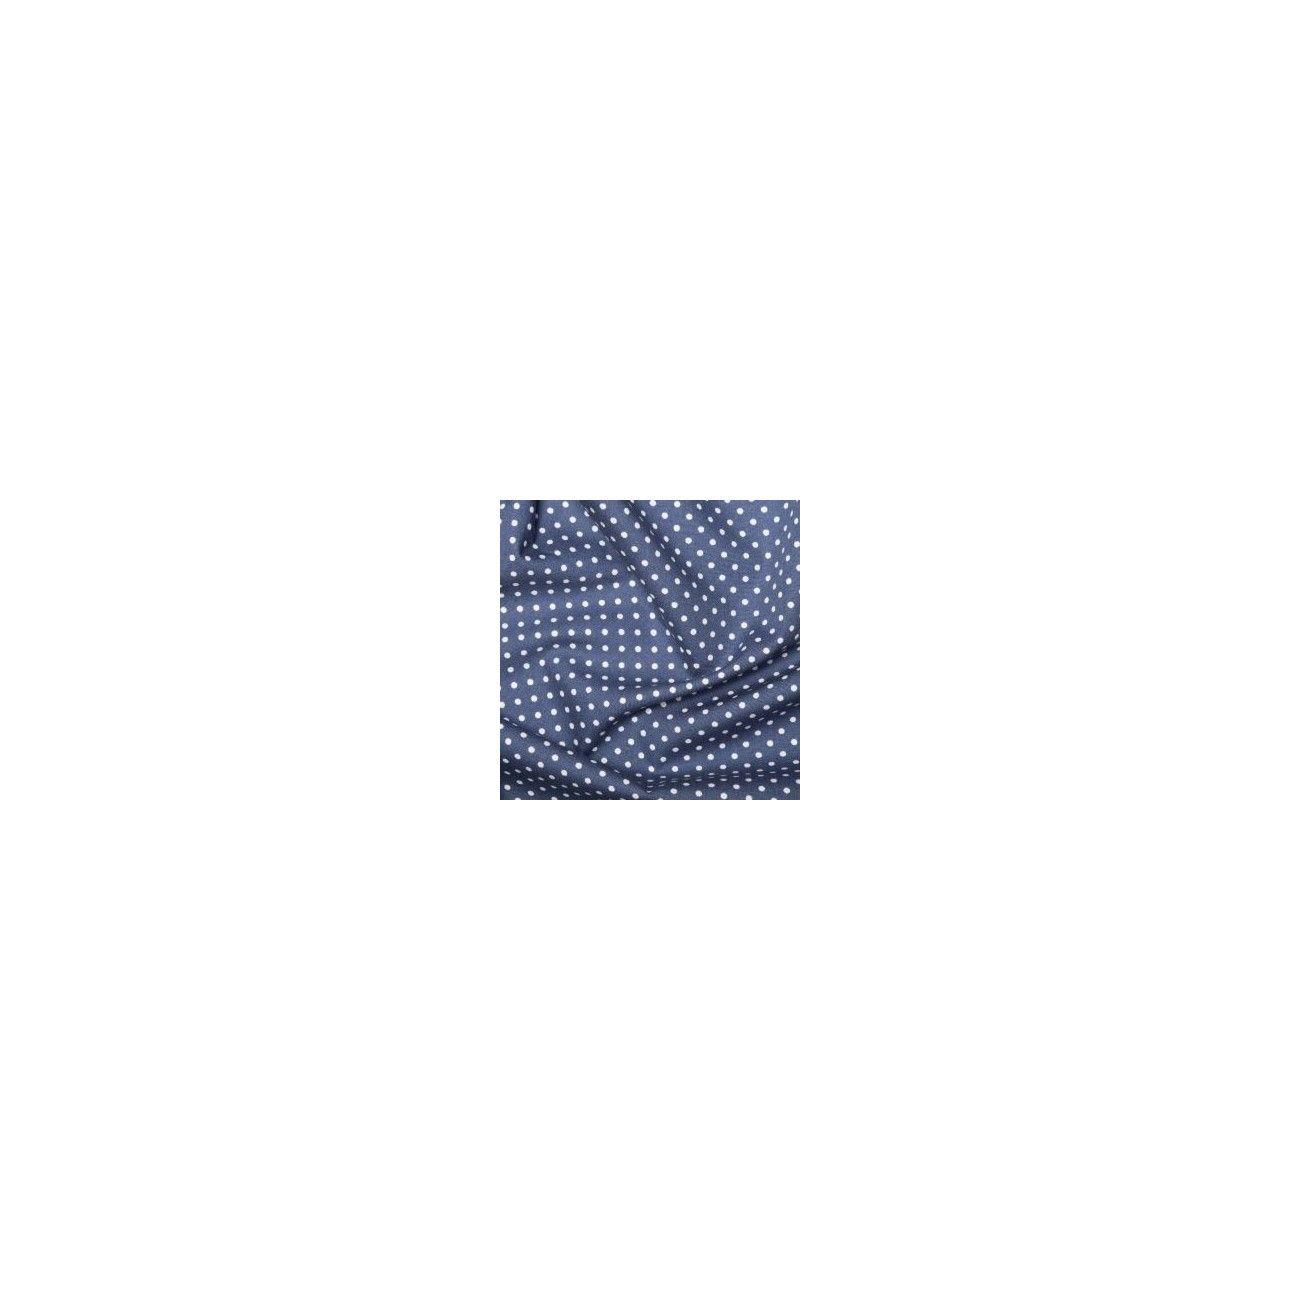 Tissu Pois Bleu Roi